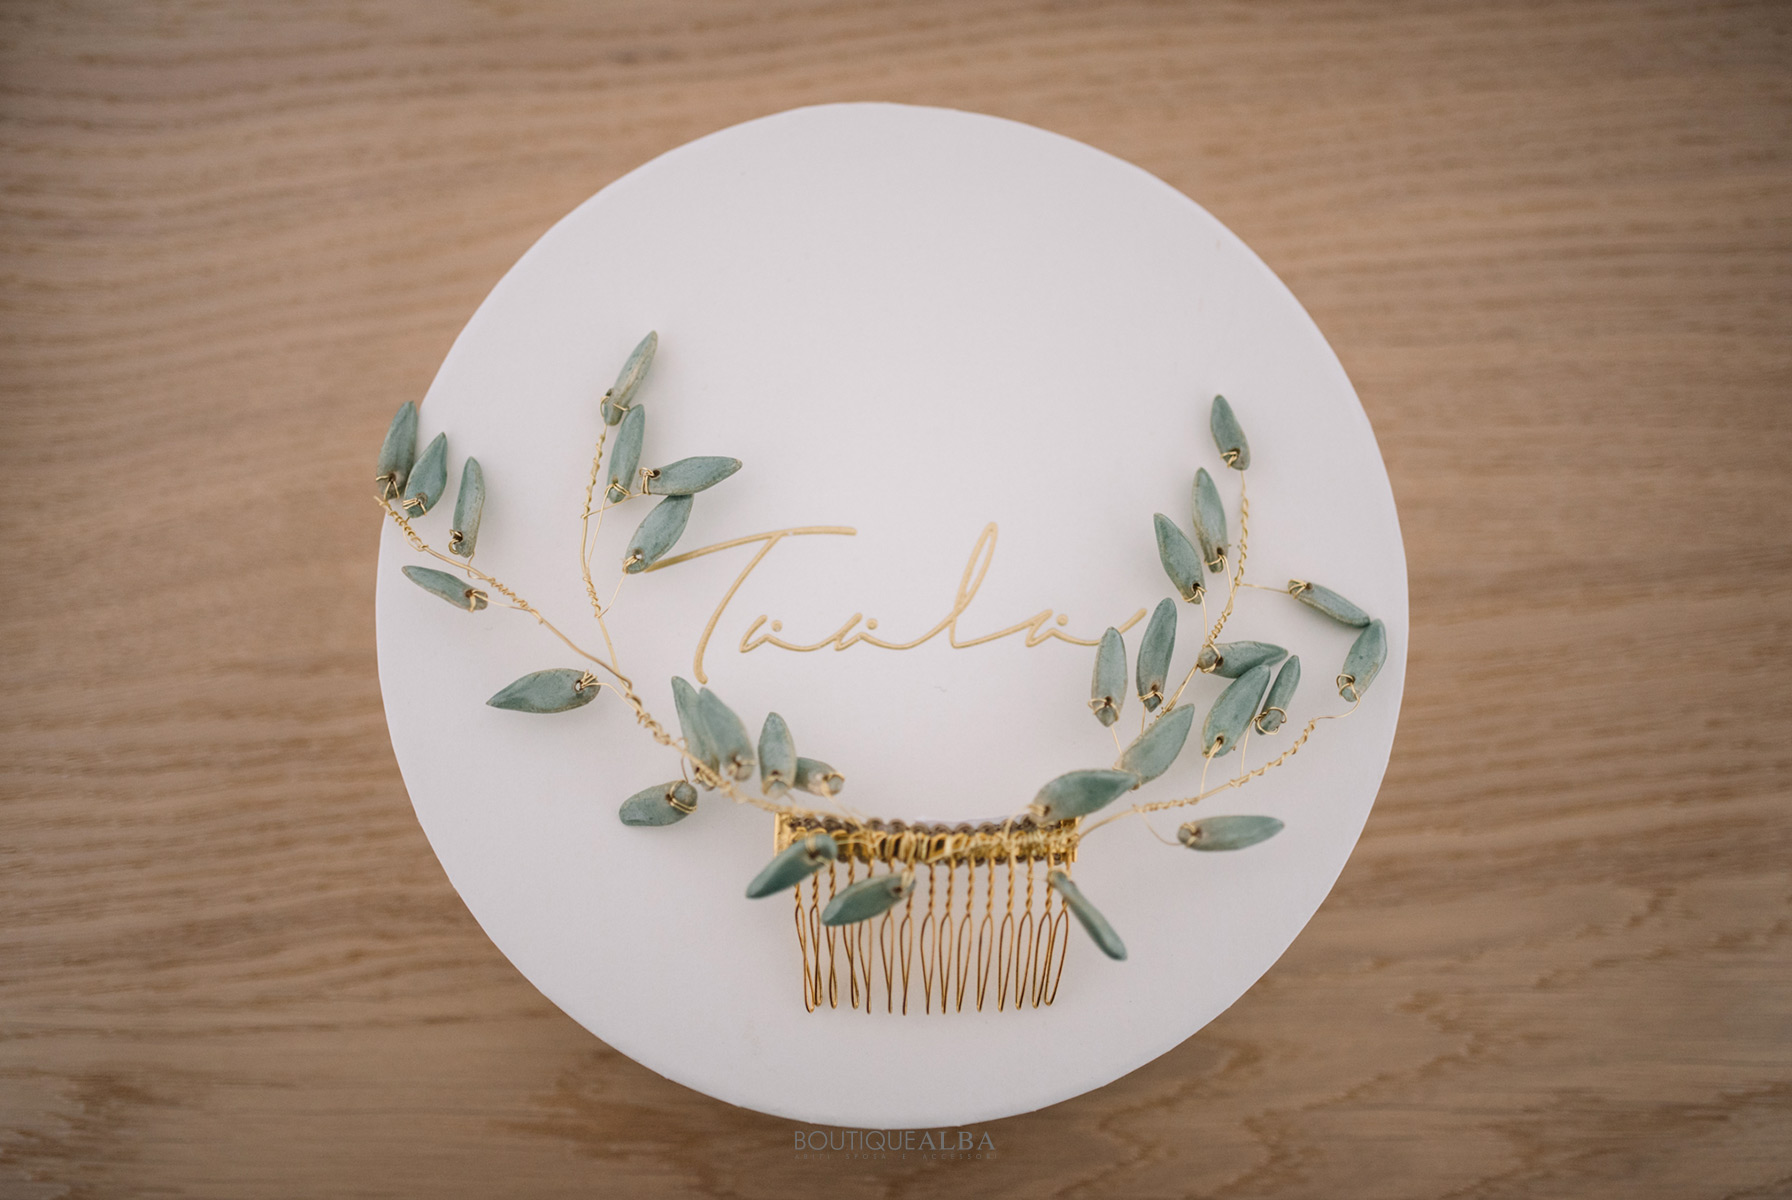 acconciatura-sposa-inporcellana-verde-salvia-taala-boutique-alba-cerchietto-1